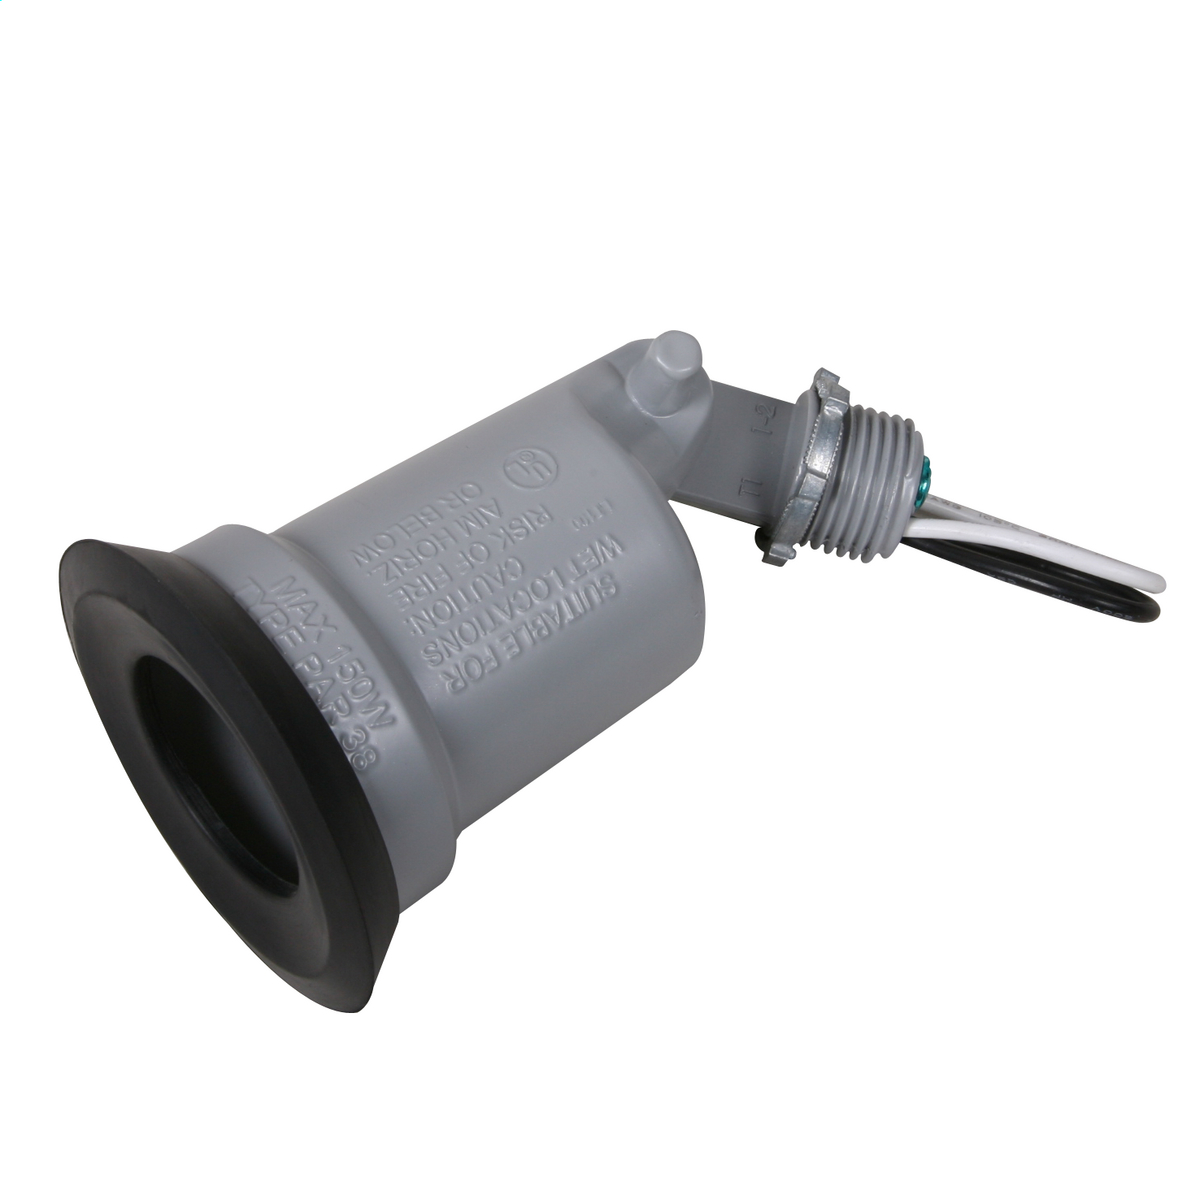 TMAC LT100S GRY STD LAMPHOLDER